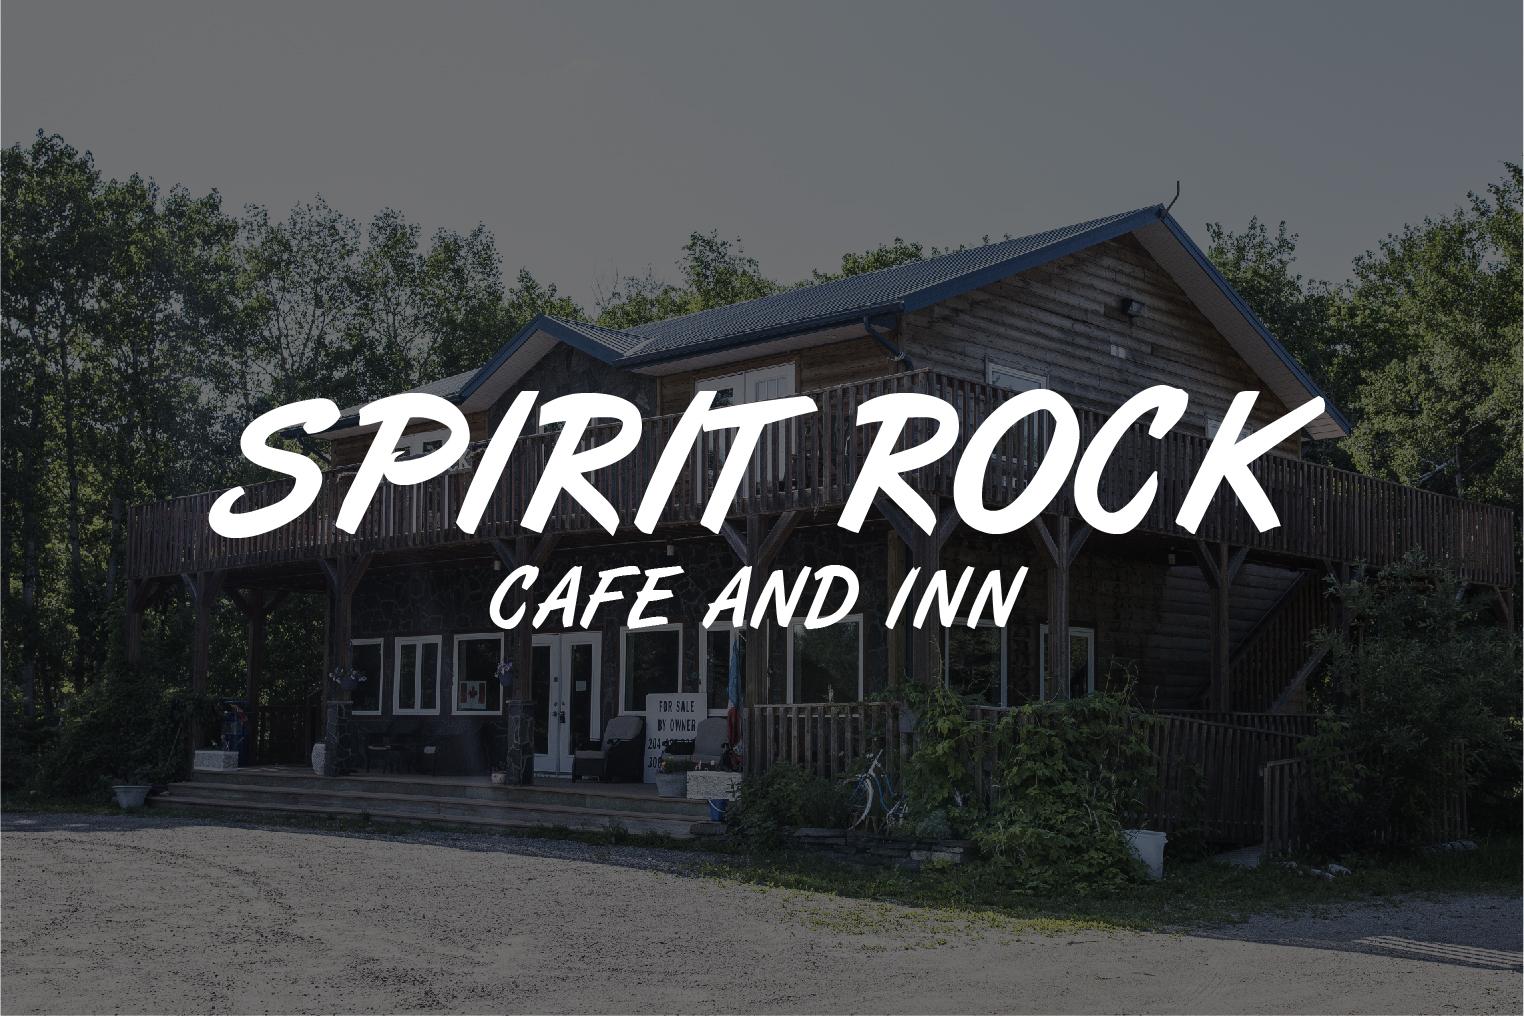 SPIRIT ROCK CAFE